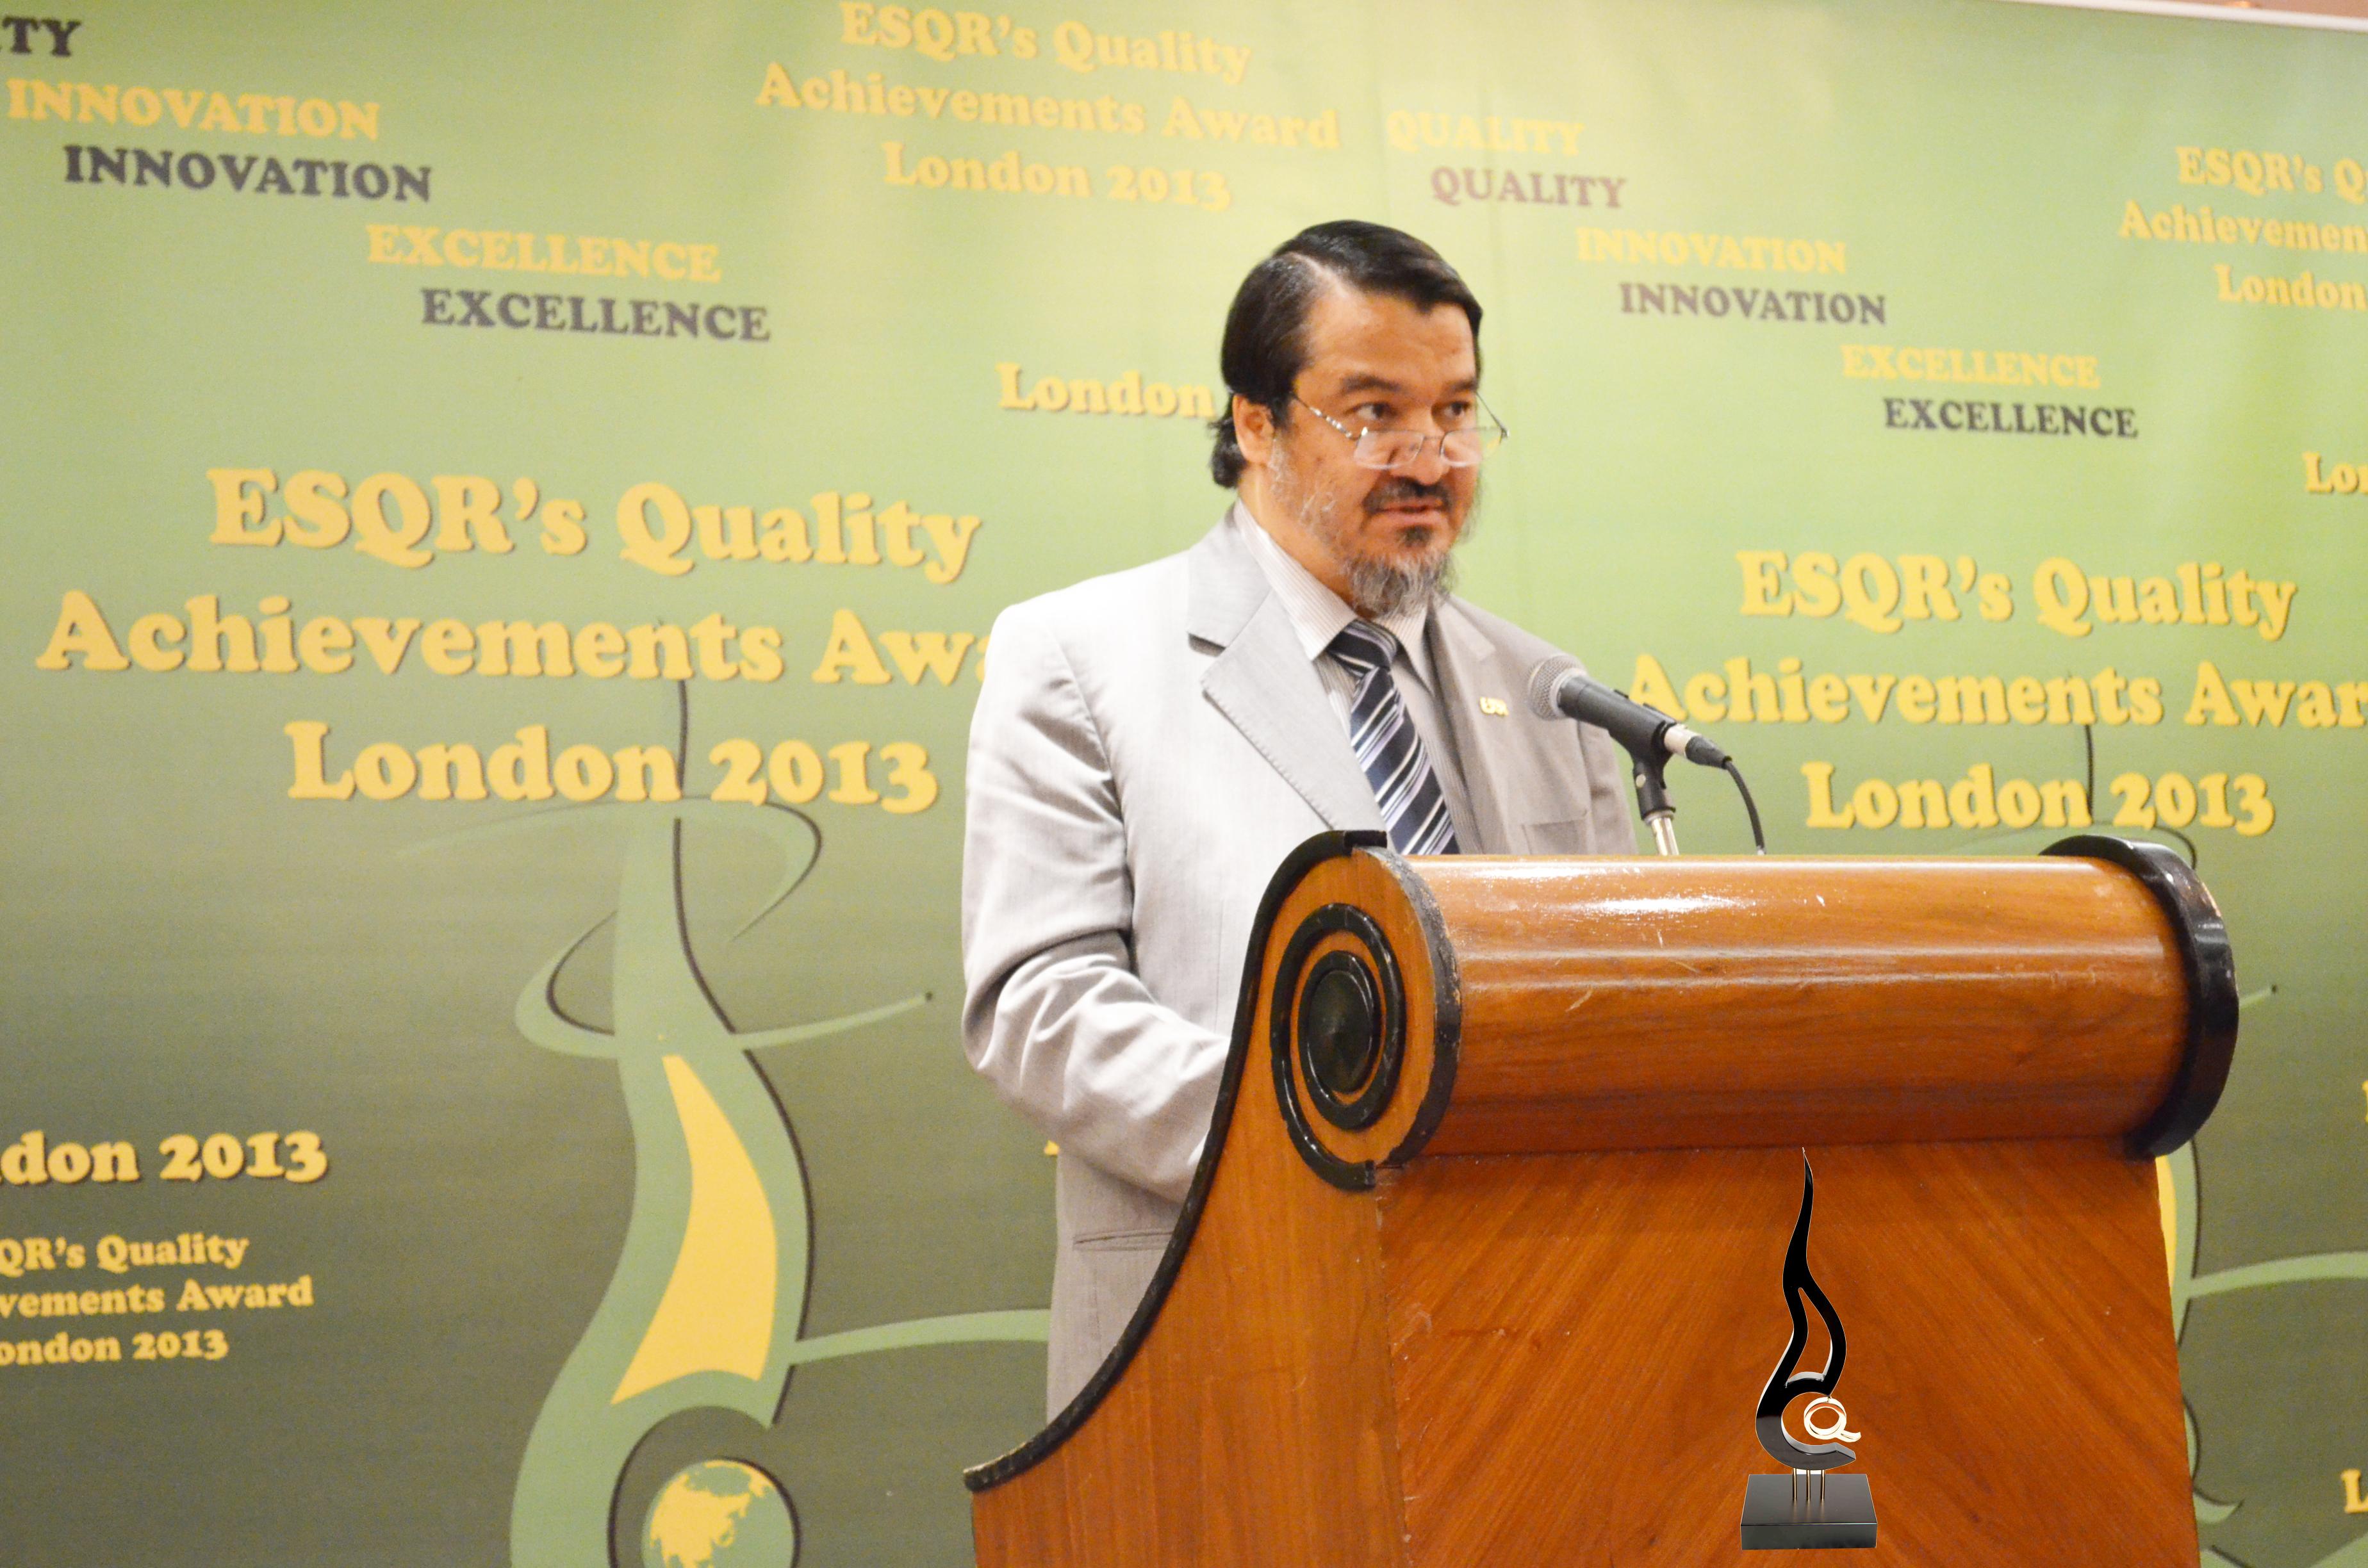 KUNA : GCC Health Ministers Council earns new ESQR award